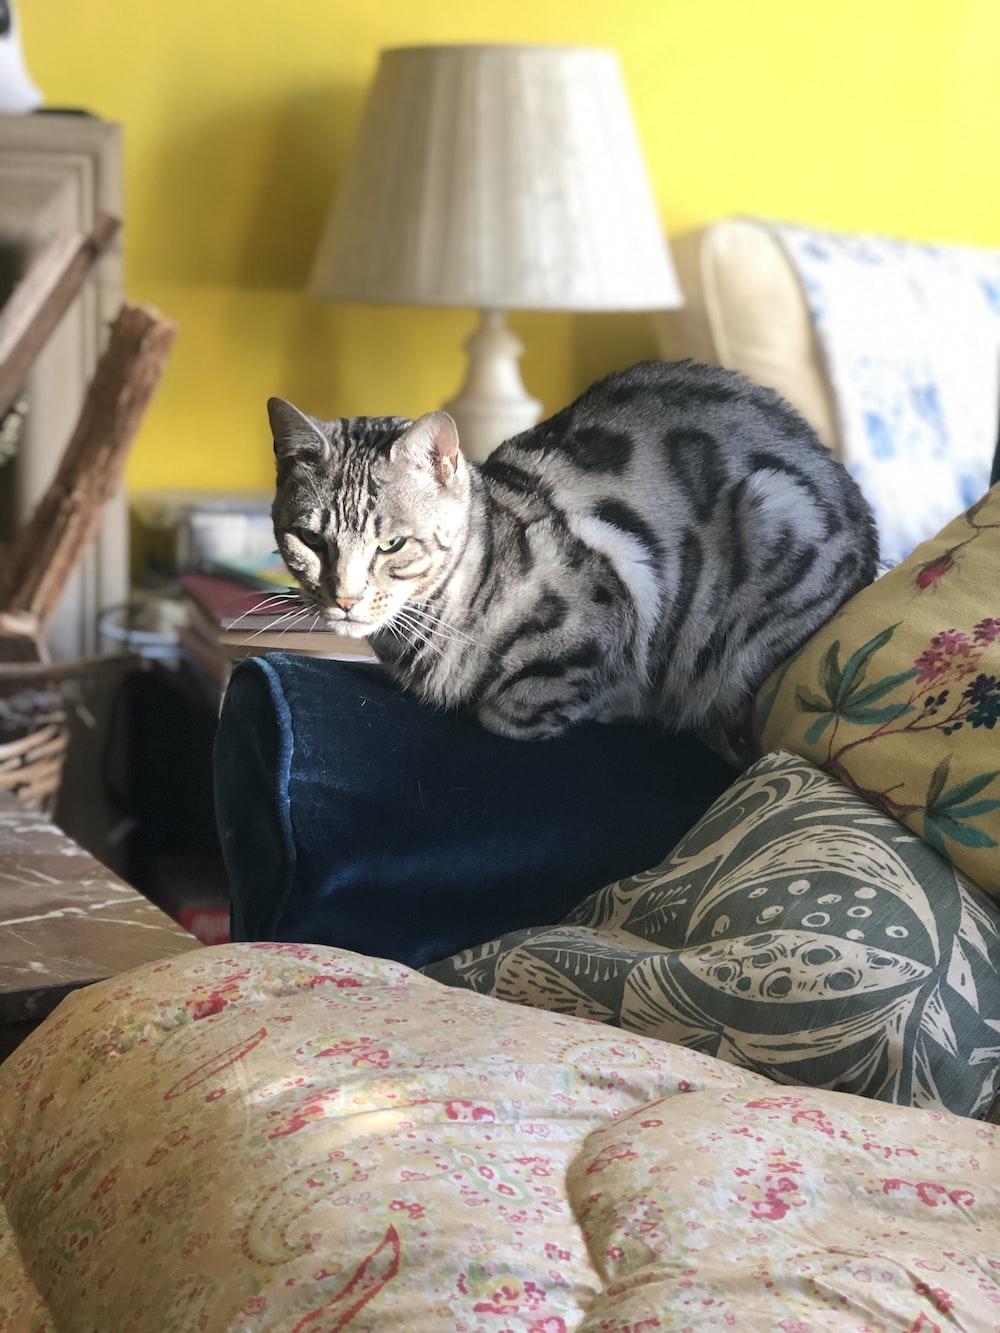 silver bulls-eye cat